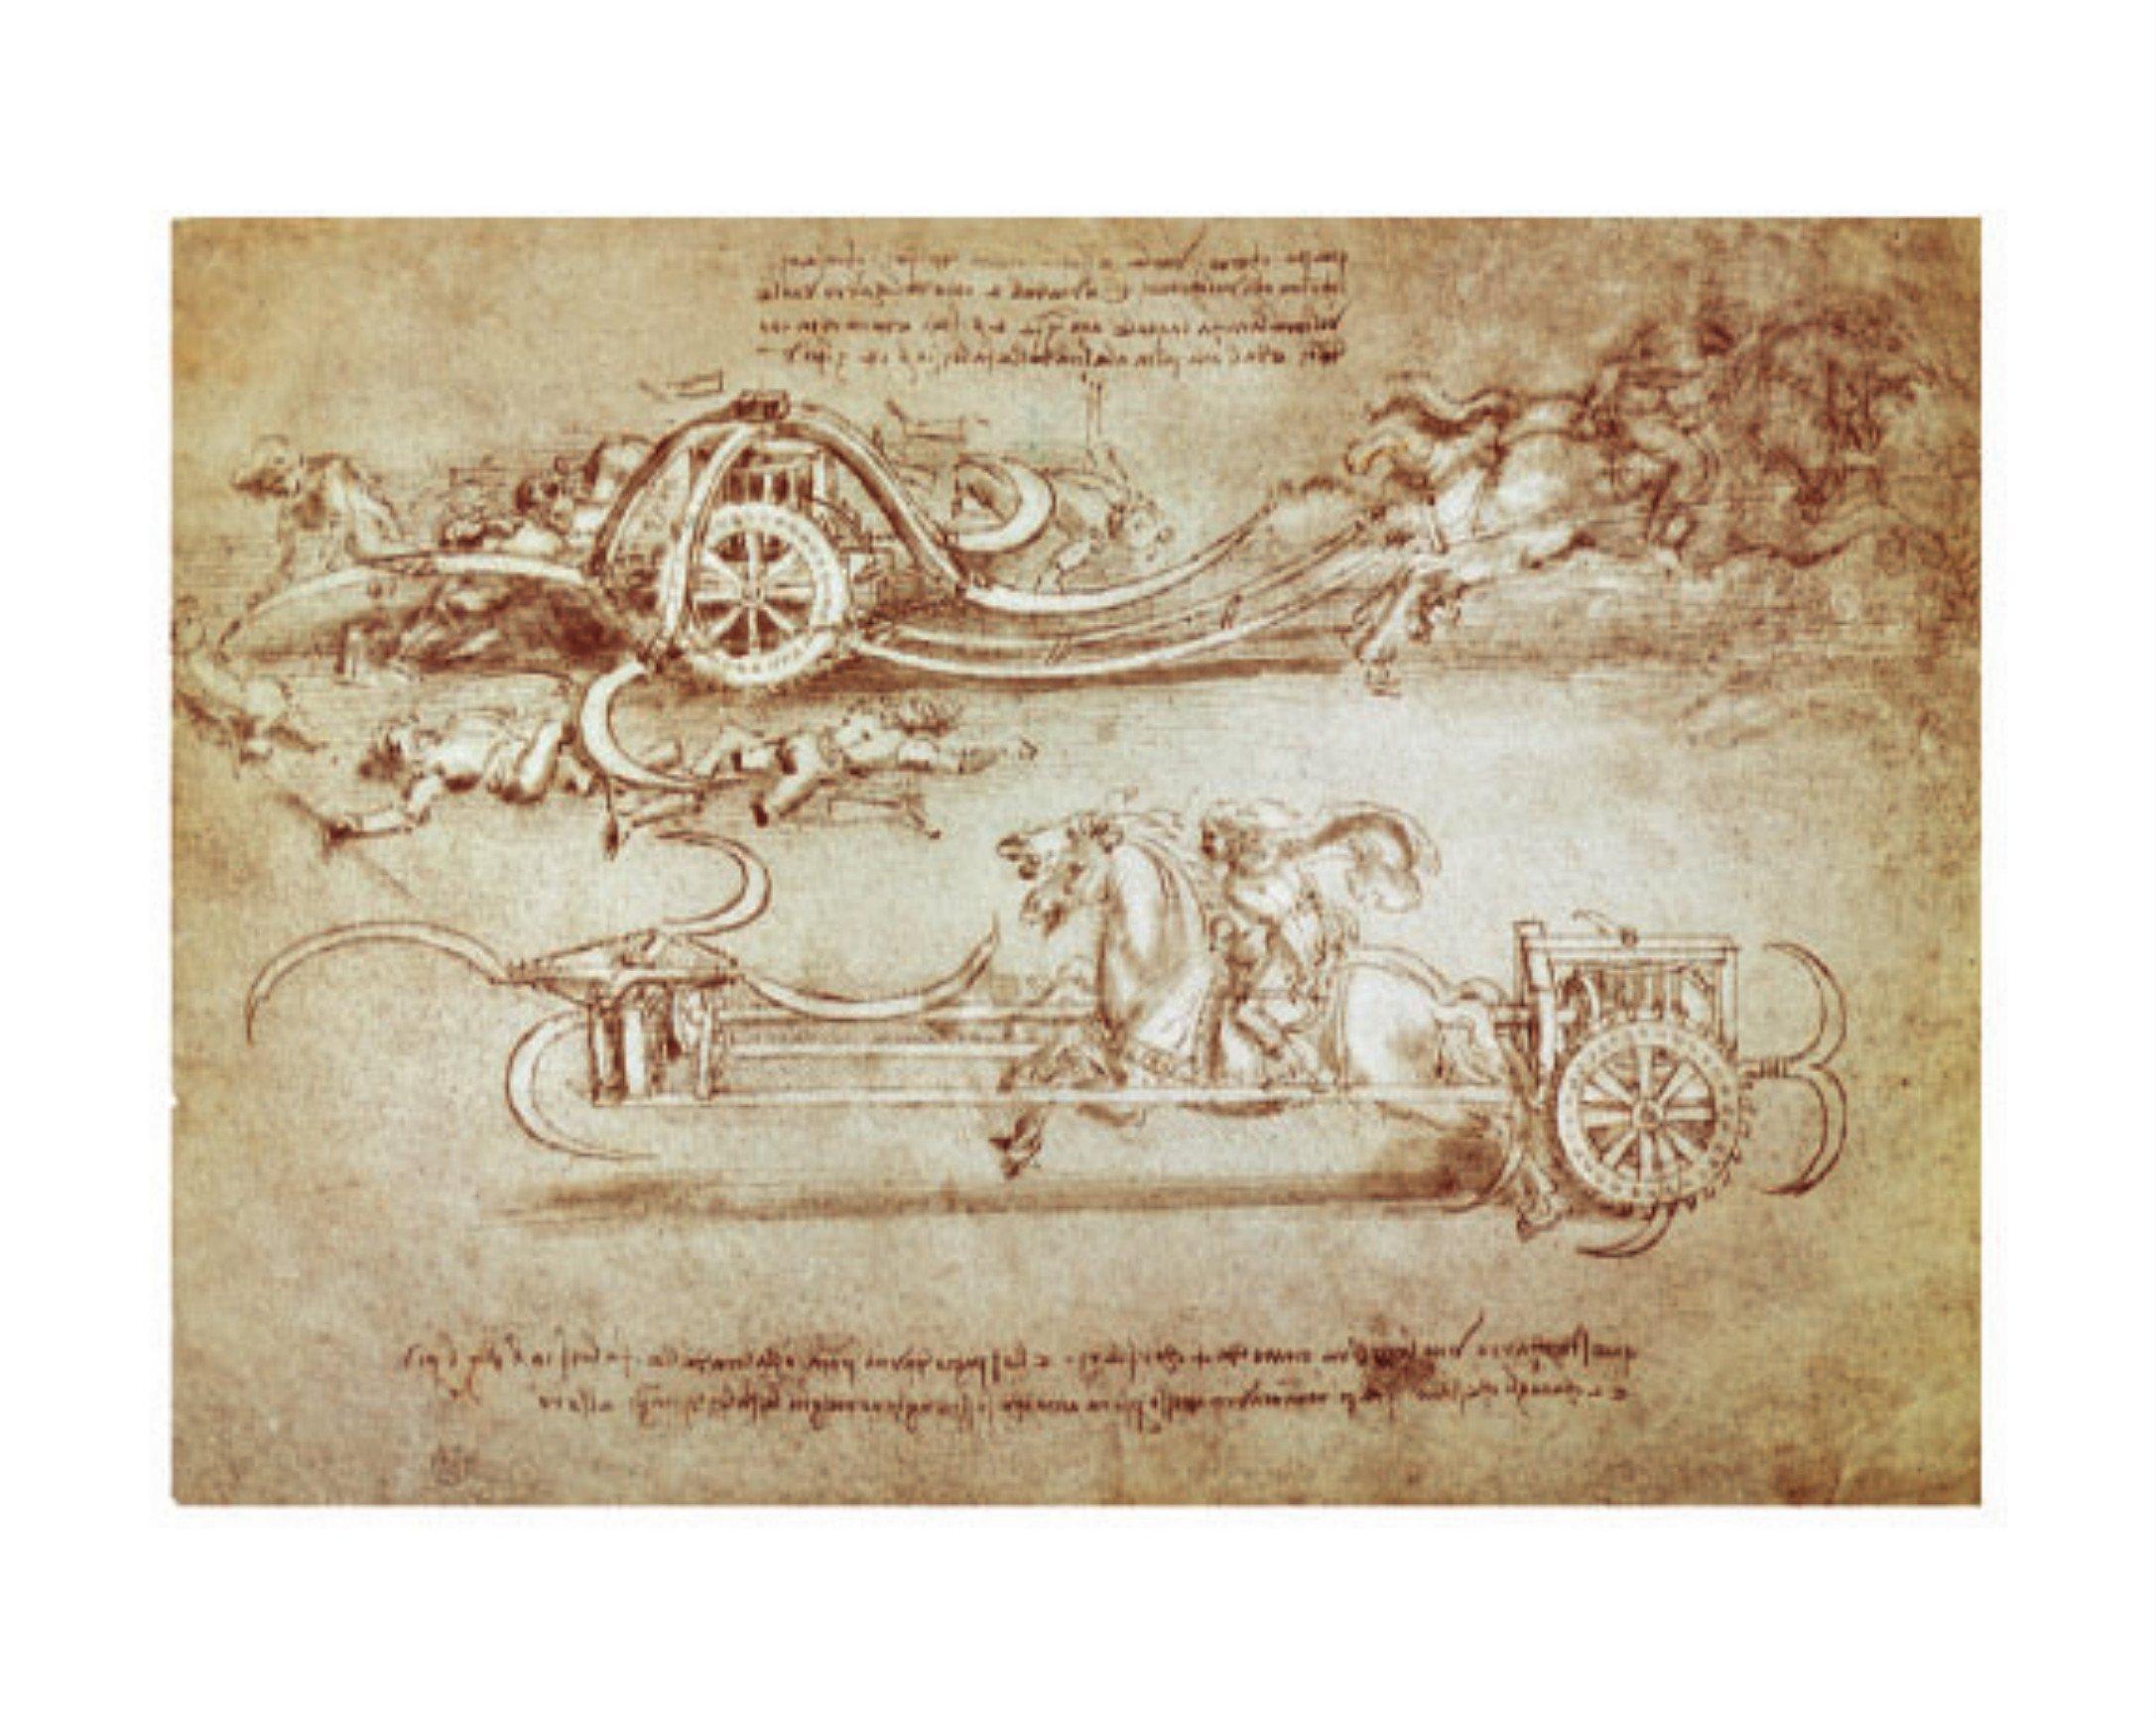 Da Vinci Drawings: Amazon.es: Leonardo da Vinci: Libros